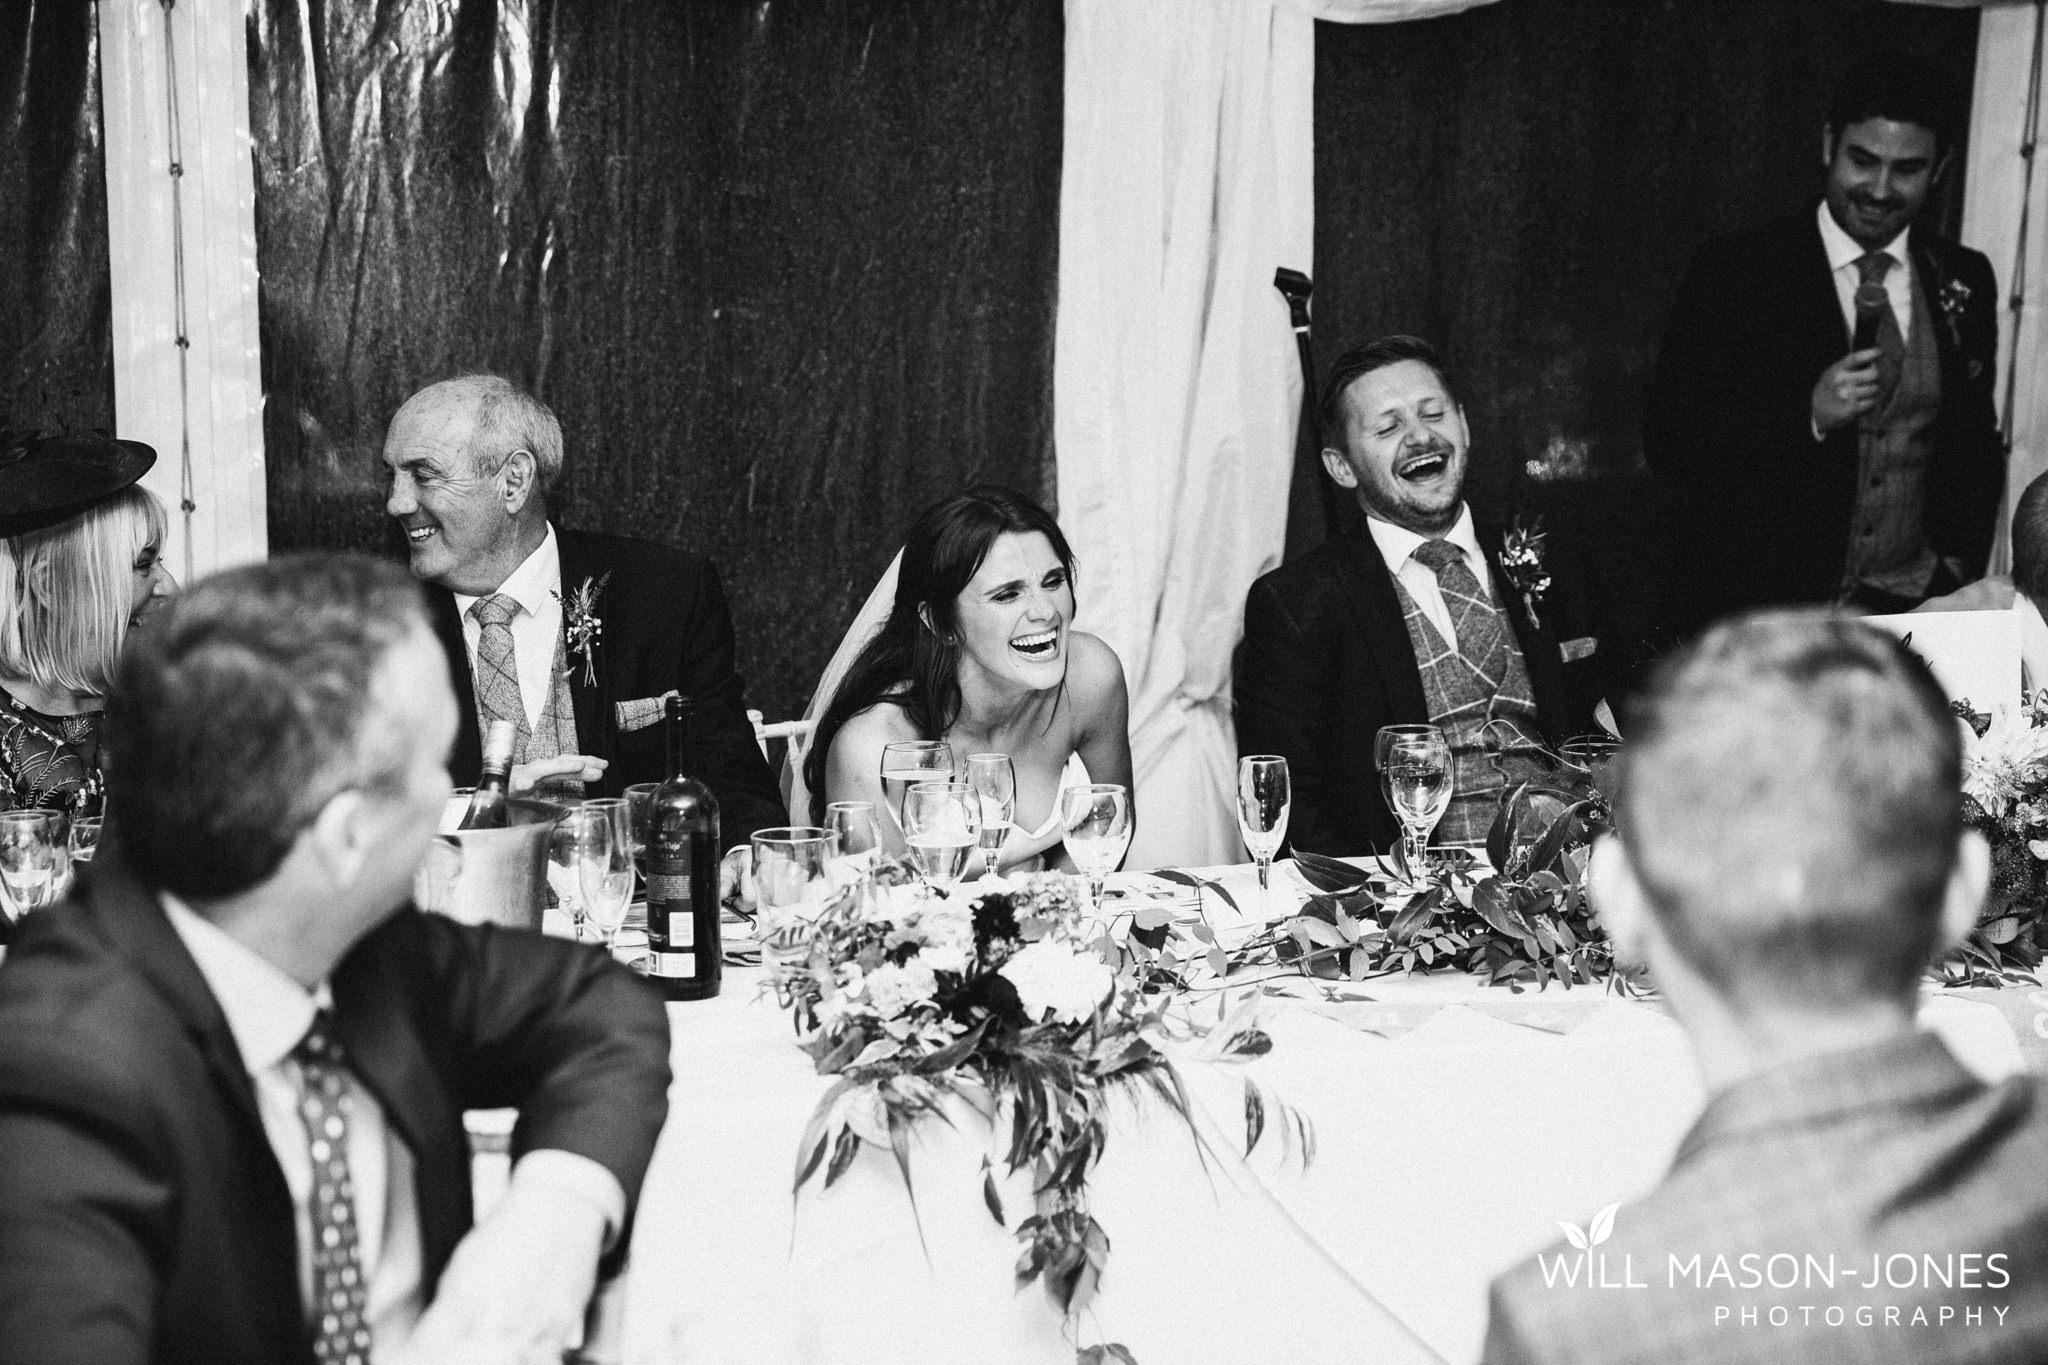 plas-glansevin-wet-carmarthen-swansea-wedding-photographers-natural-relaxed-34.jpg